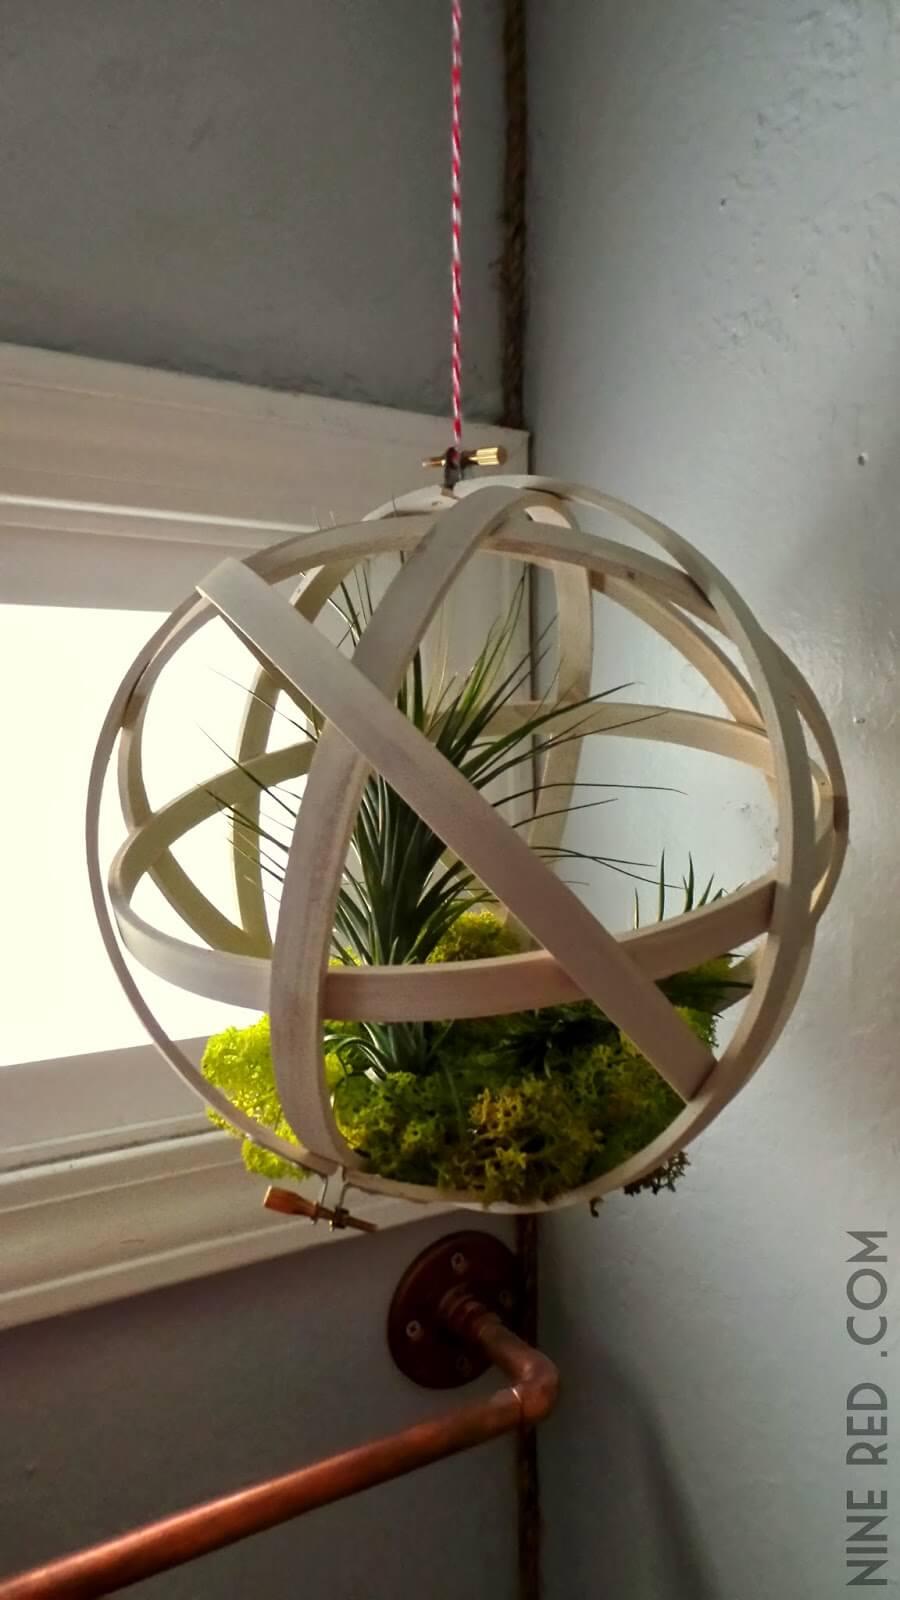 Encased Ball of Springtime Greenery